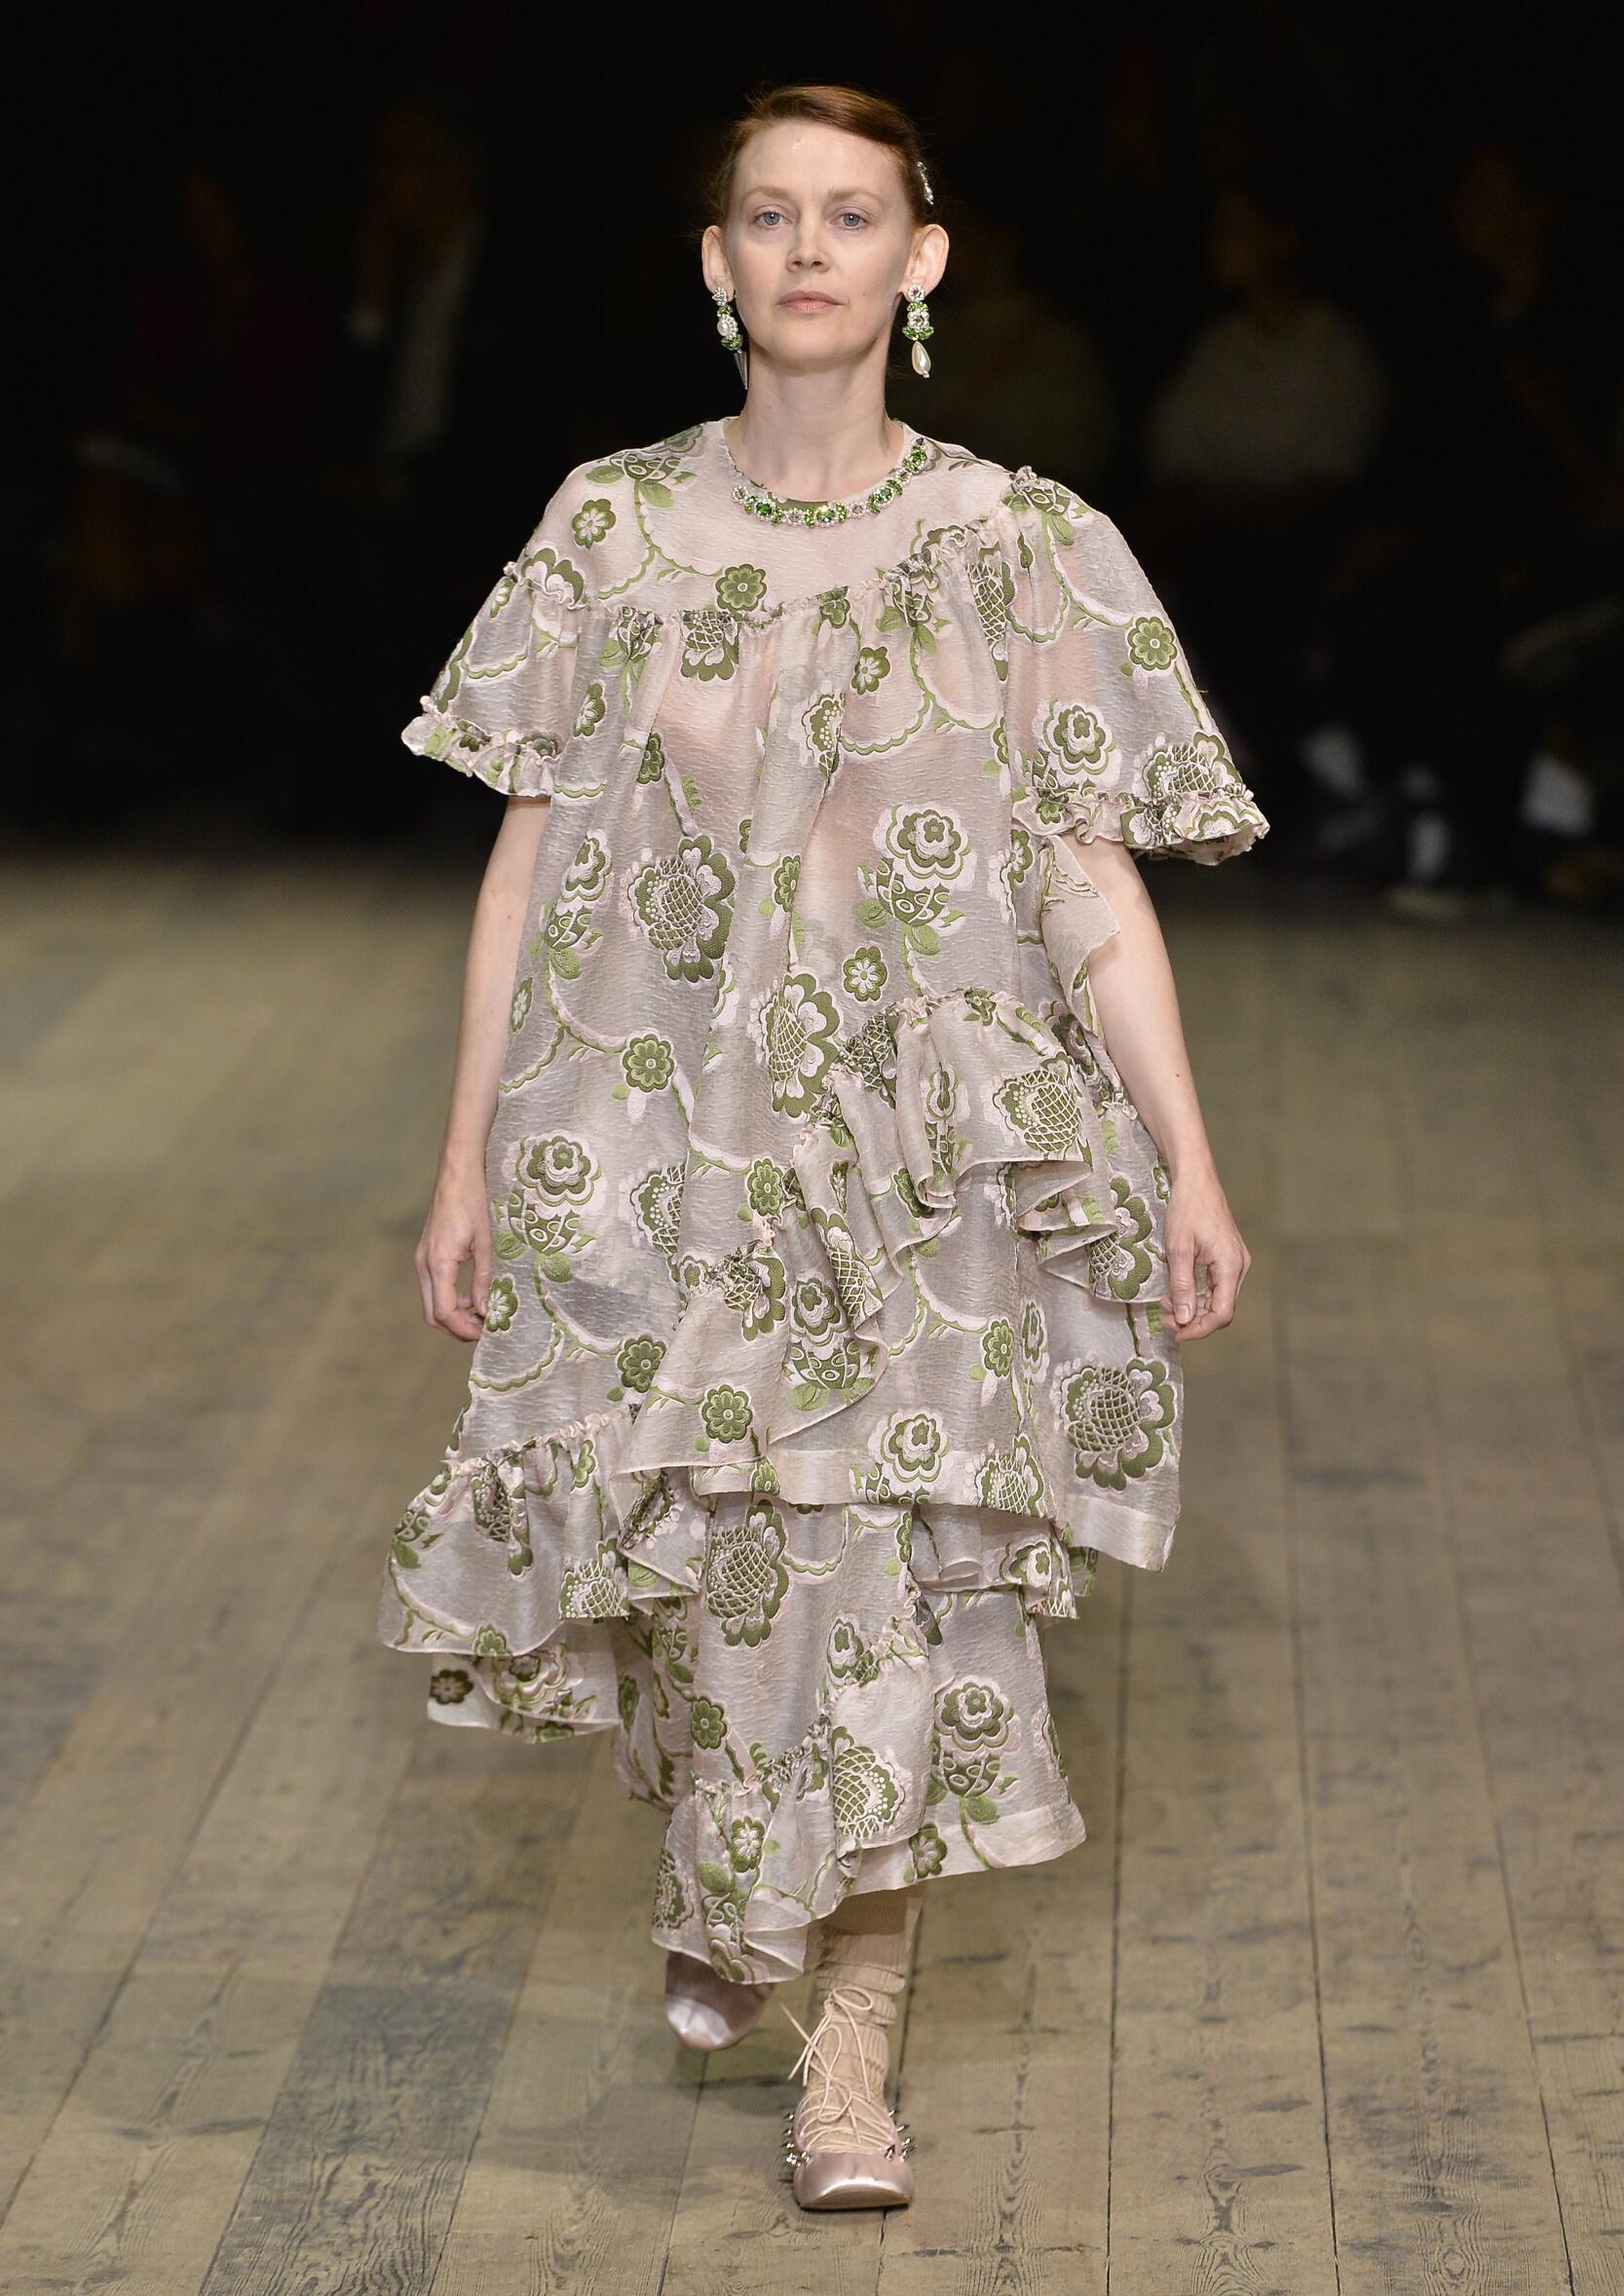 Simone Rocha SS 2020 Womenswear